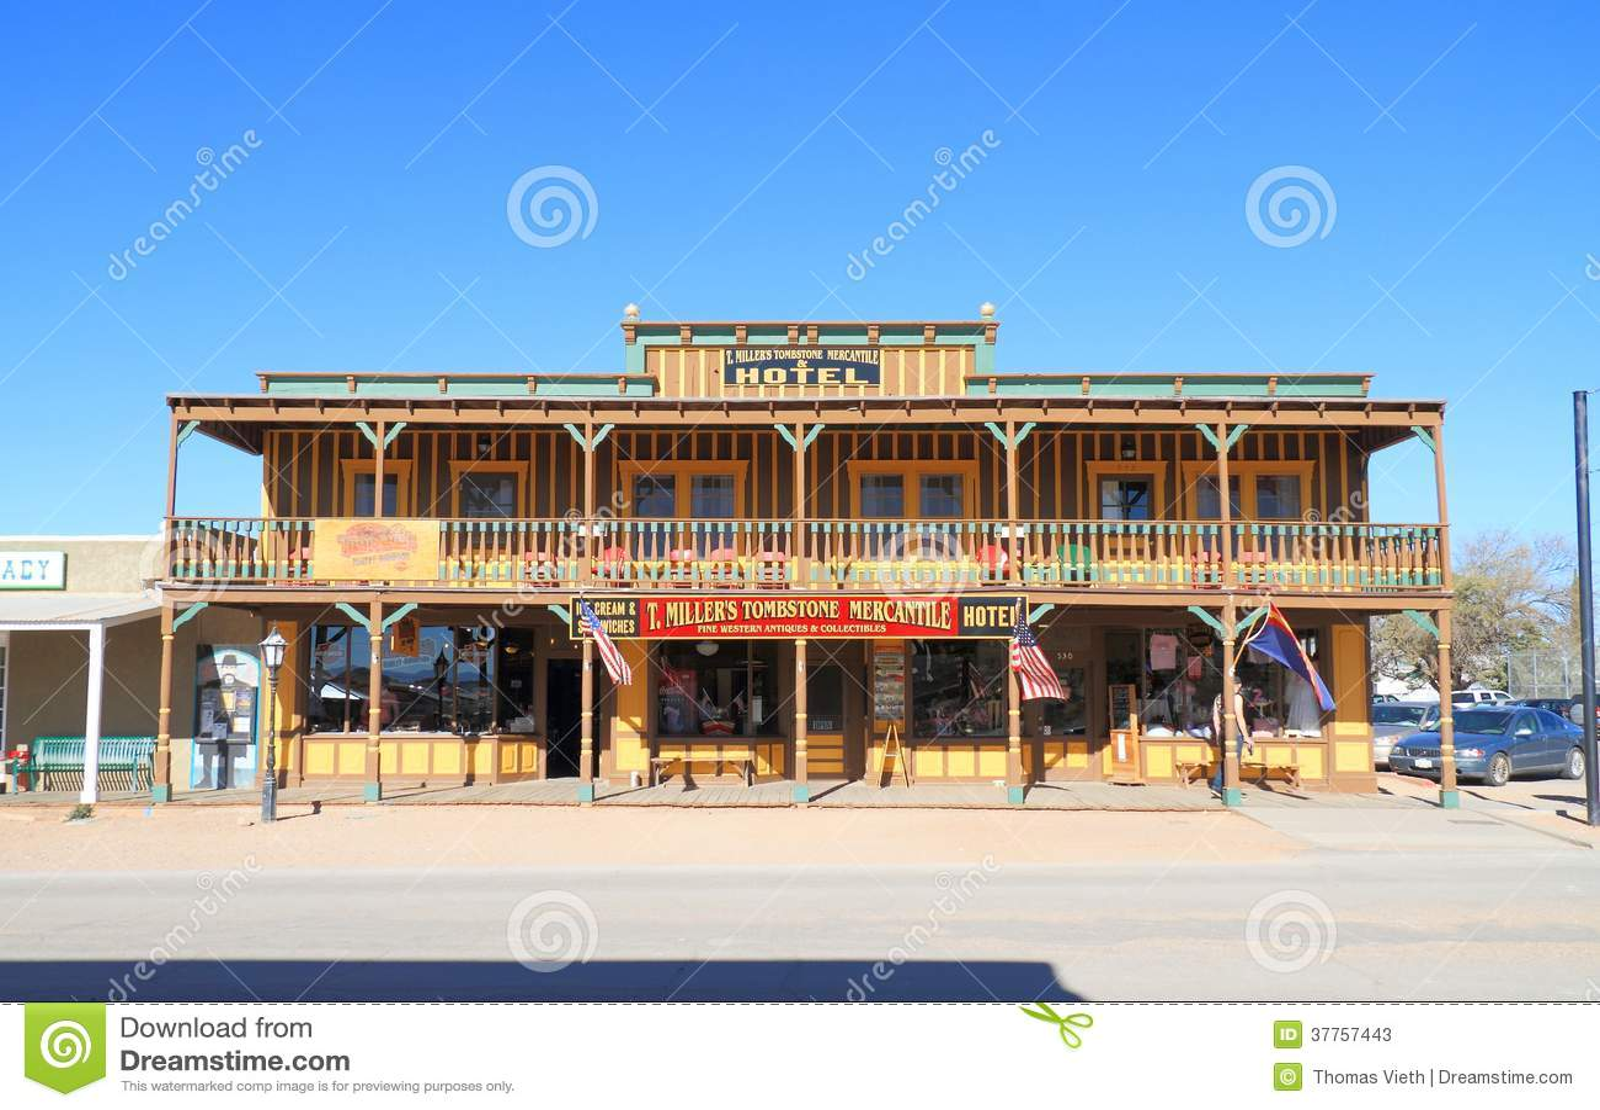 США, Аризона/надгробная плита: Исторические гостиница и магазин